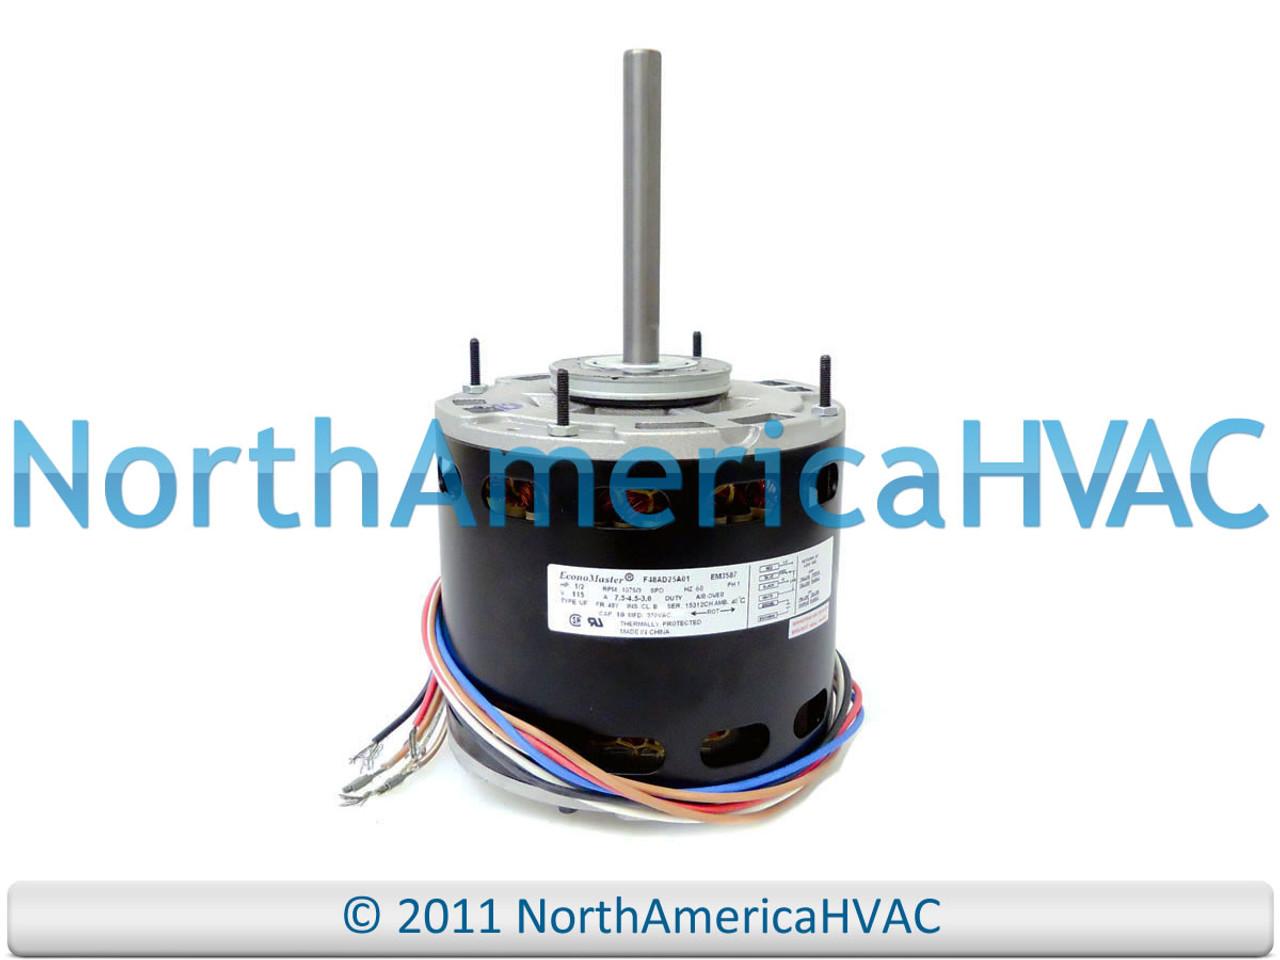 NEW EconoMaster Universal Multi-Speed Furnace BLOWER MOTOR 1/2 HP 115 Volt  - North America HVACNorth America HVAC